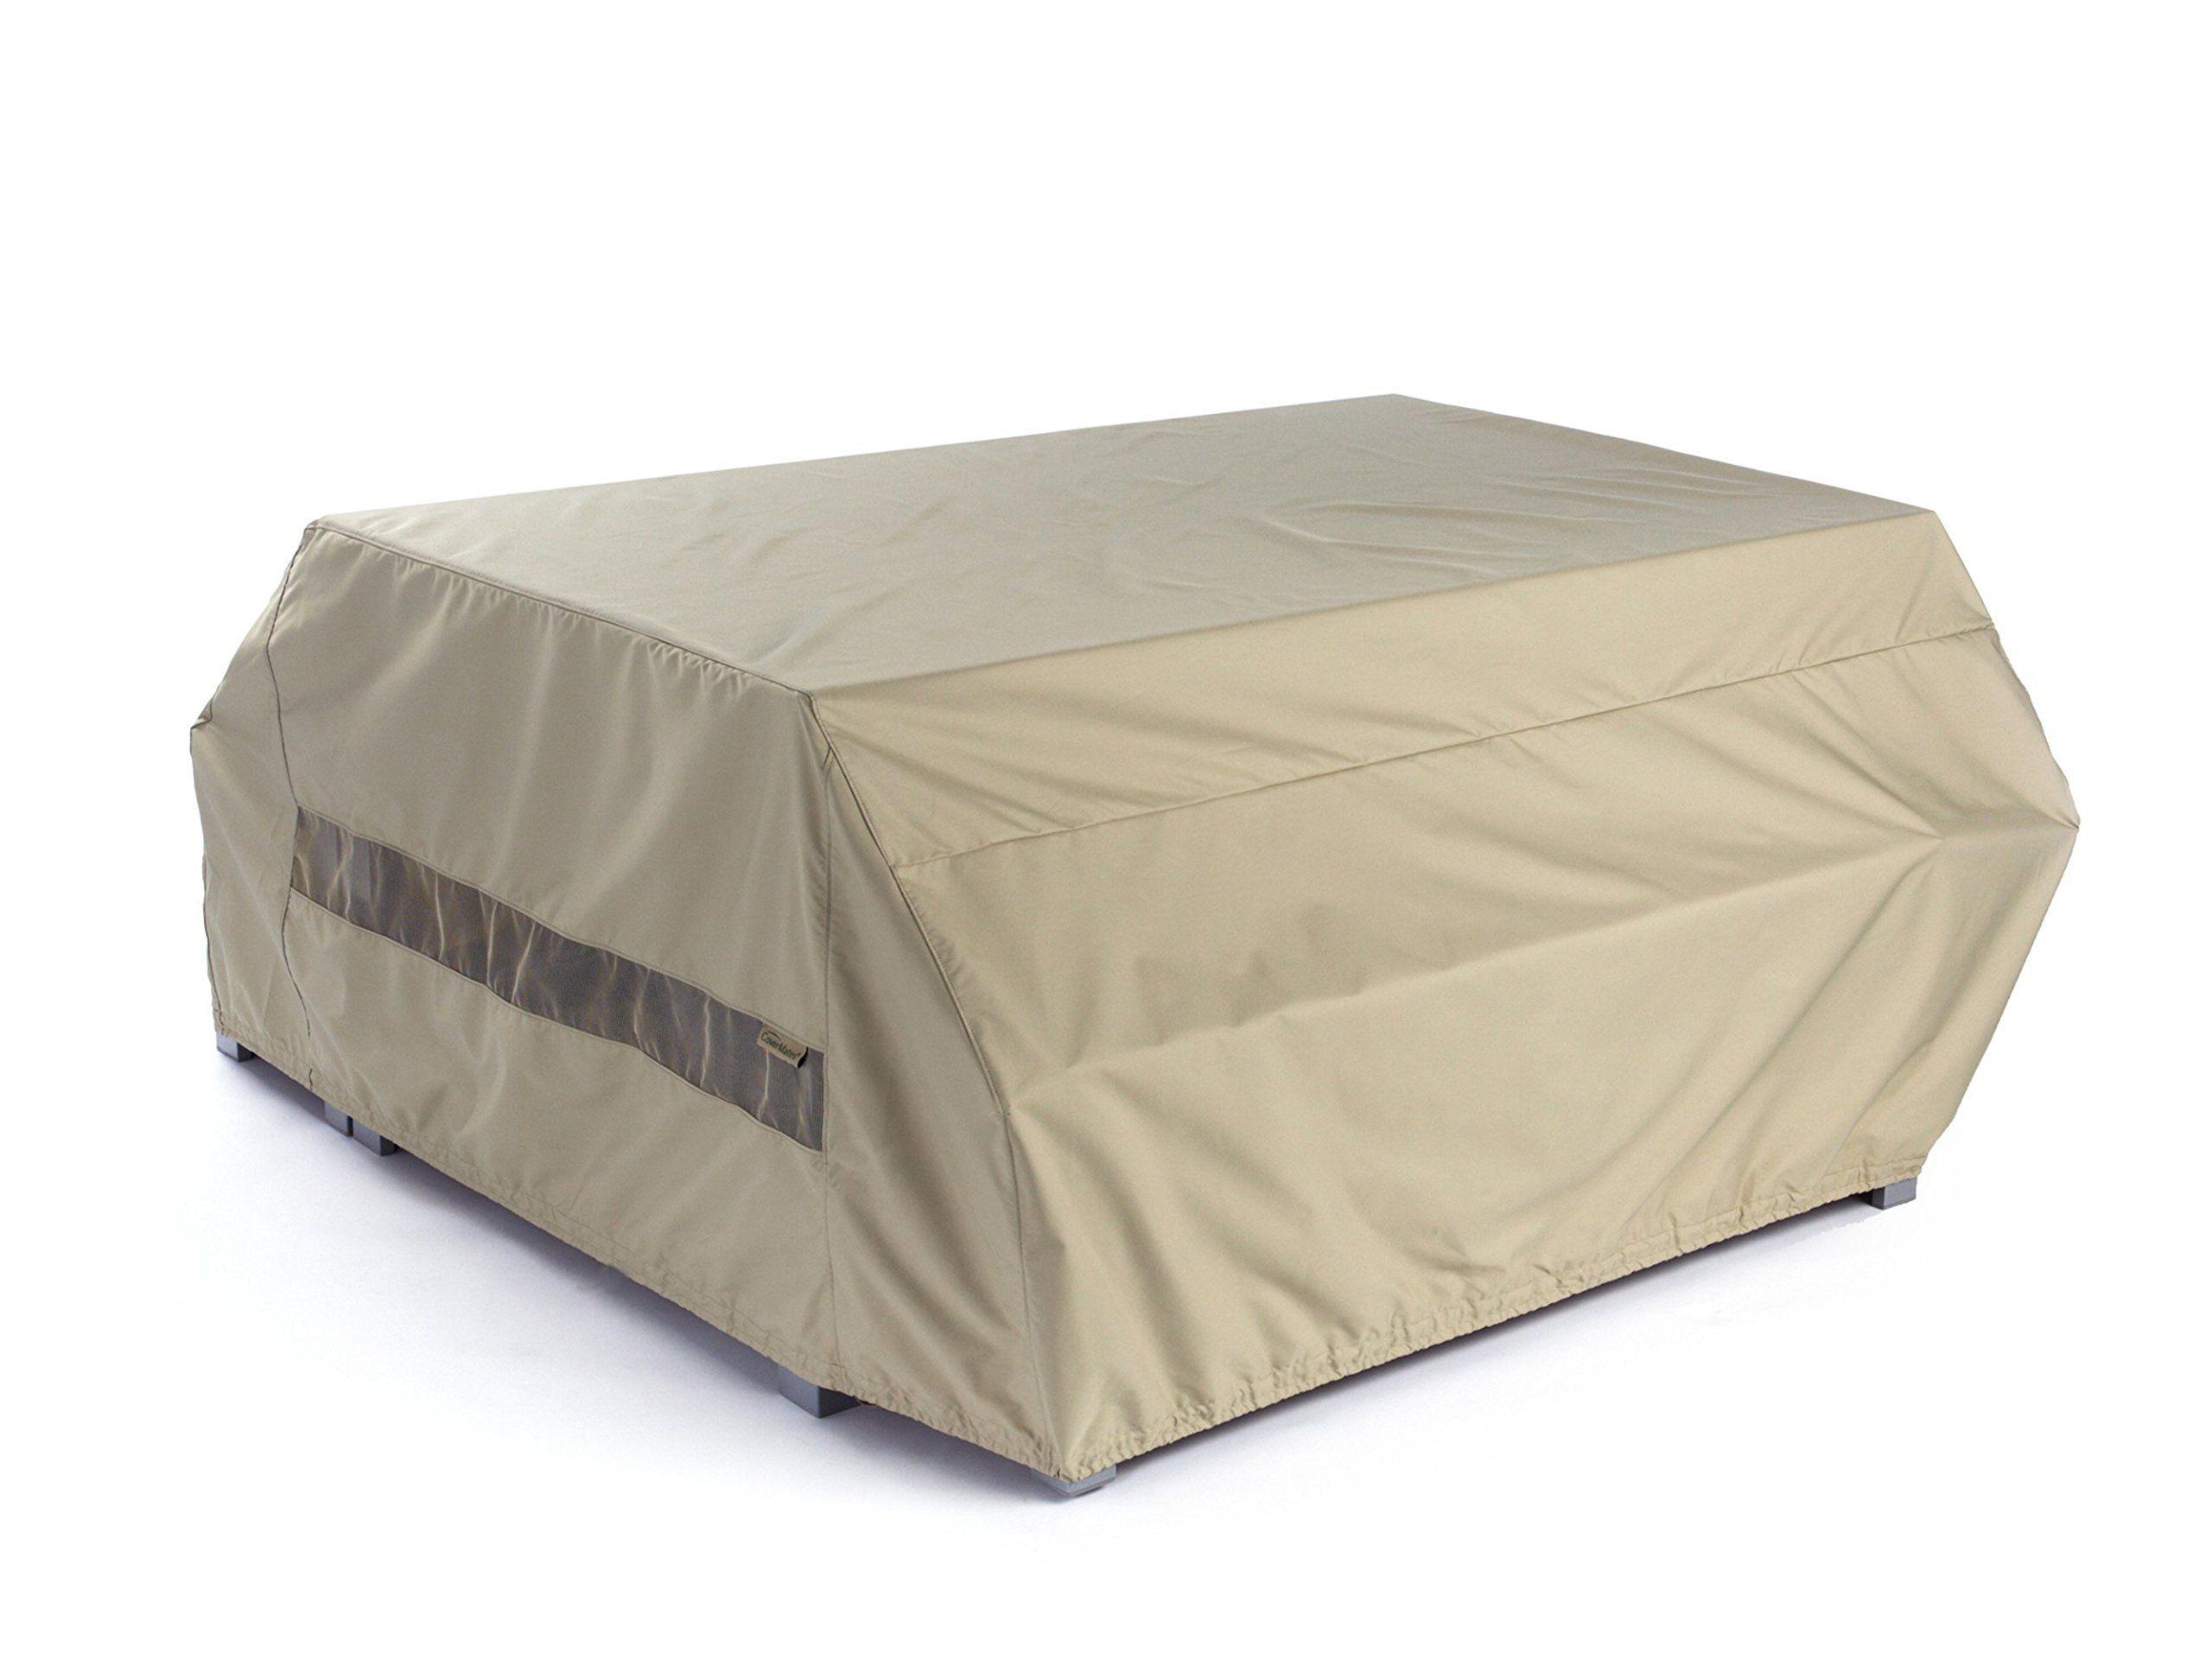 CoverMates Picnic Table Cover 76W x 62D x 32H Elite